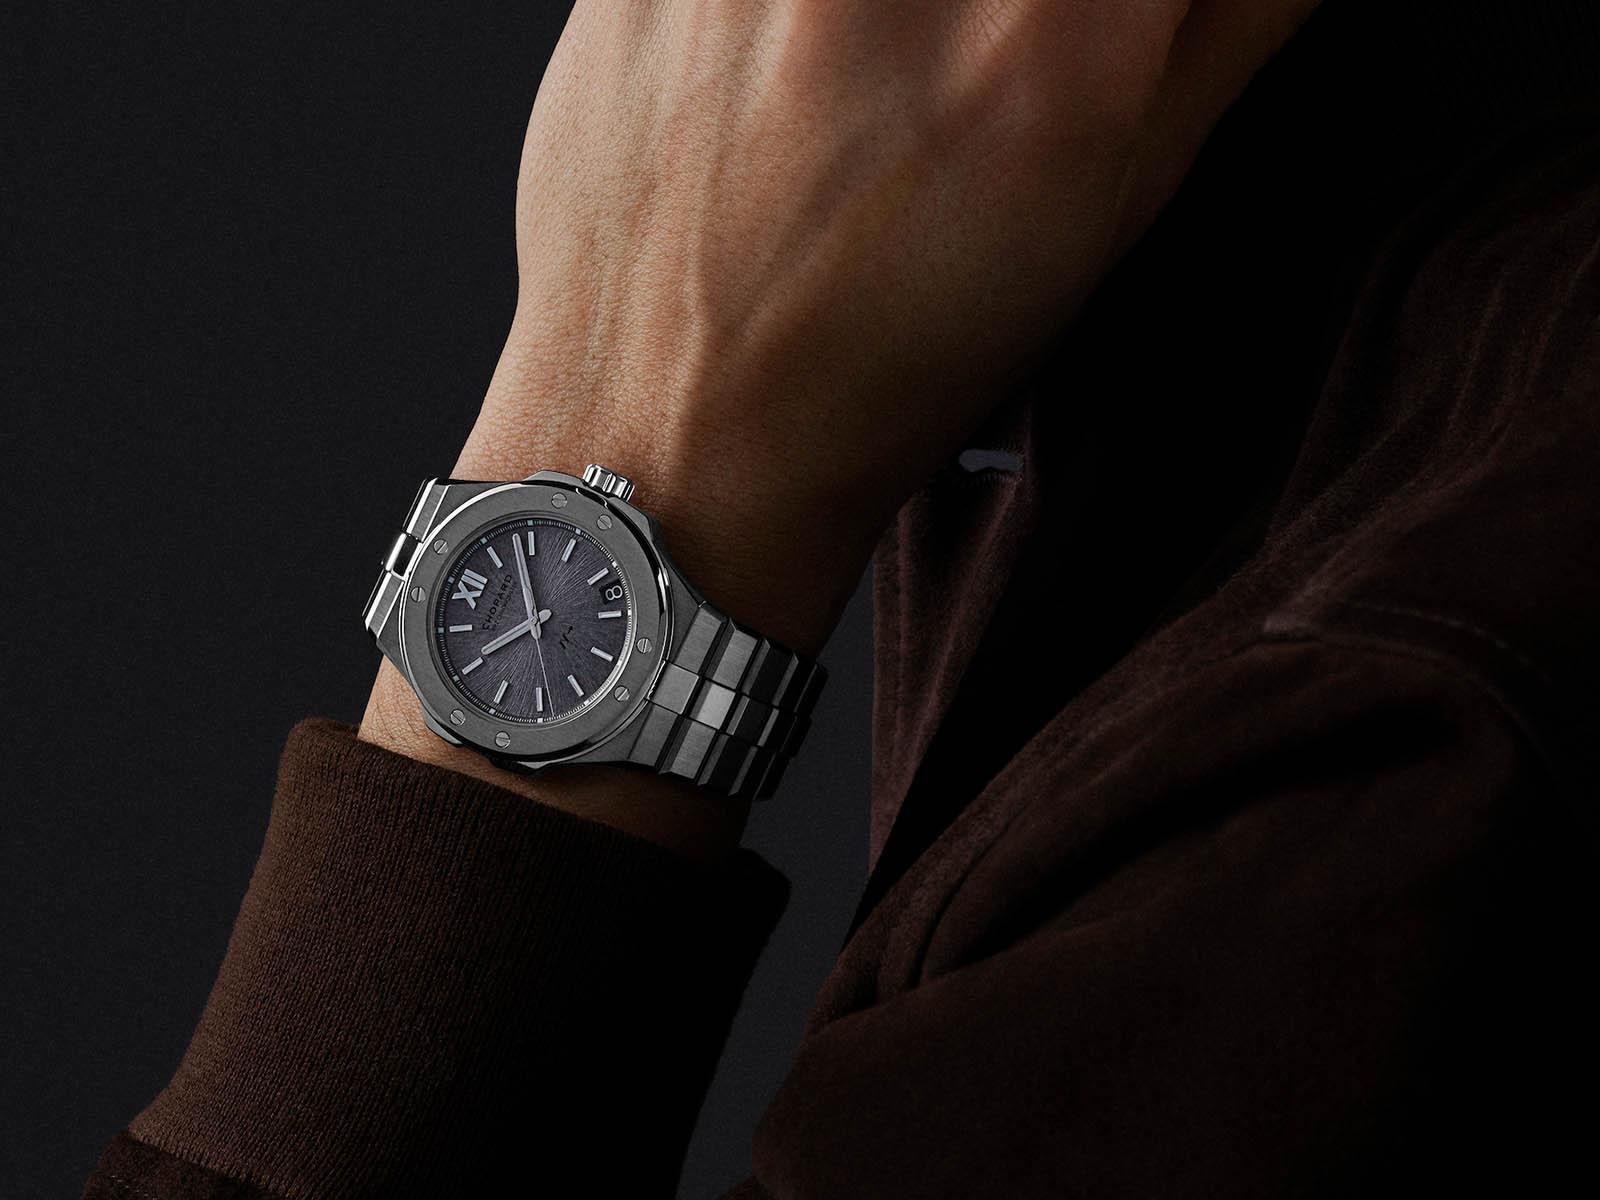 298600-3005-chopard-alpine-eagle-cadence-8hf-titanium-2.jpg